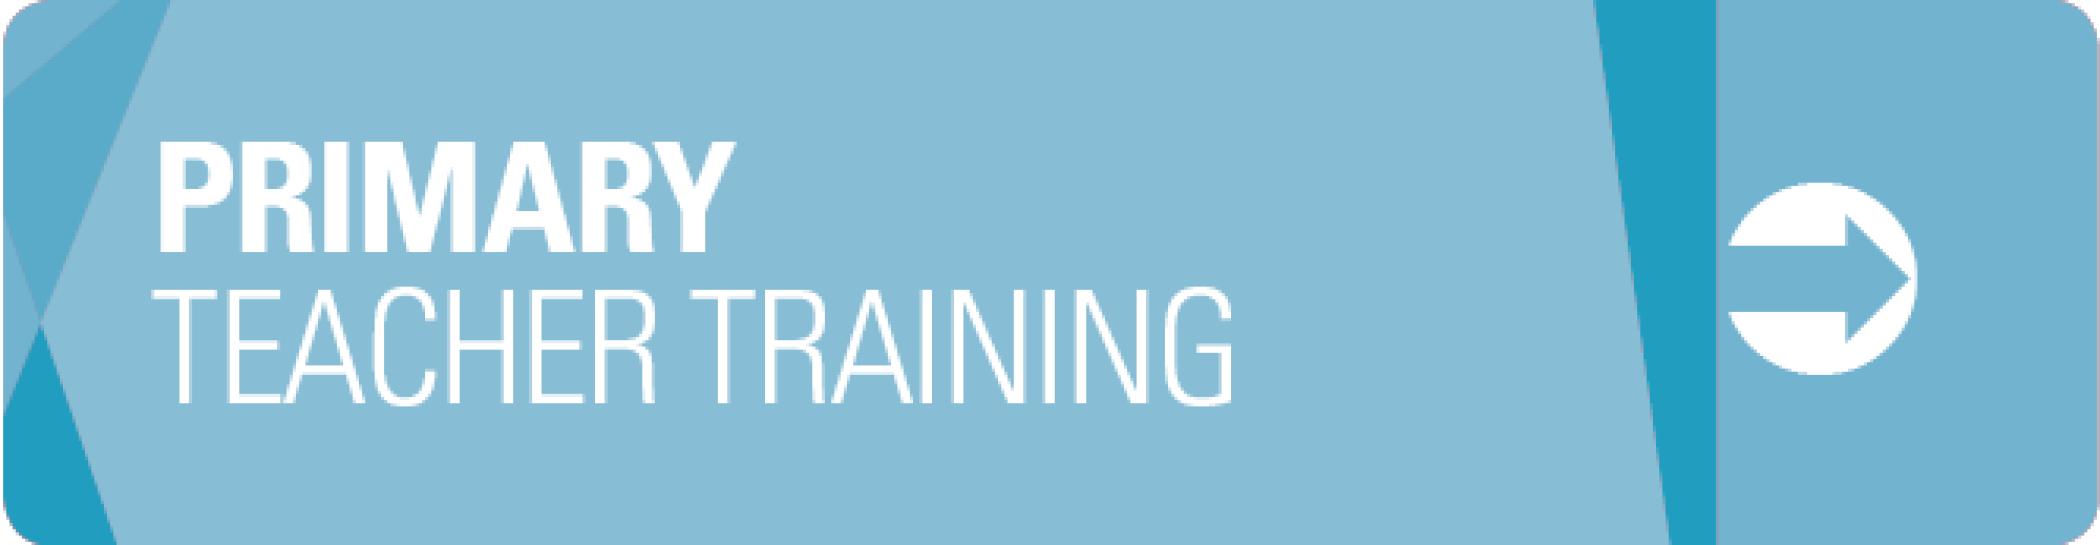 Primary School Training